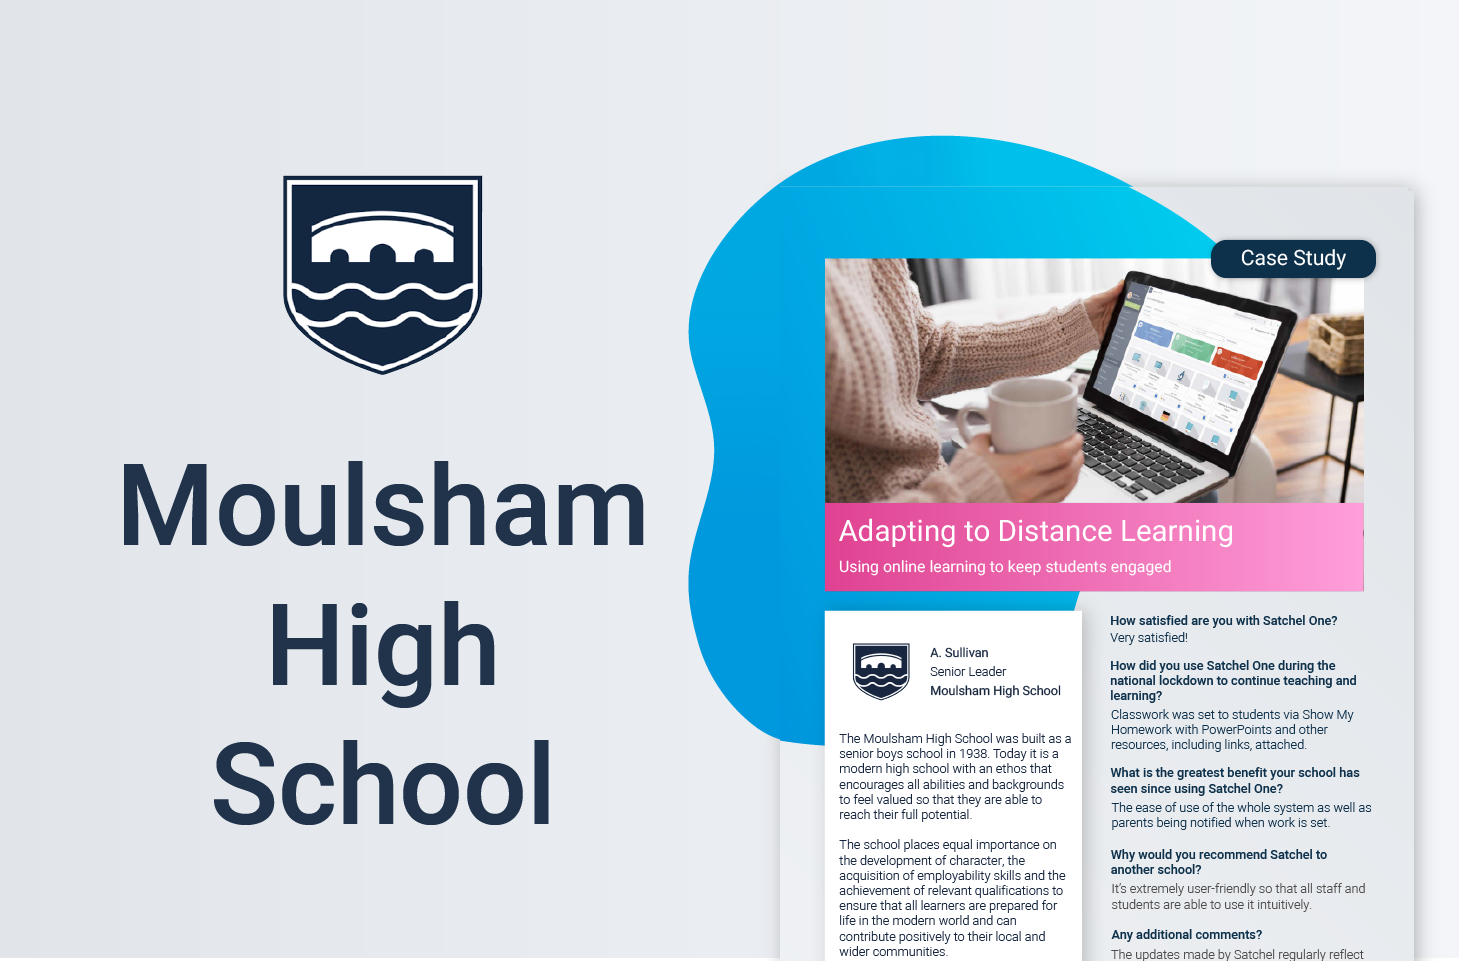 Moulsham High School Case Study